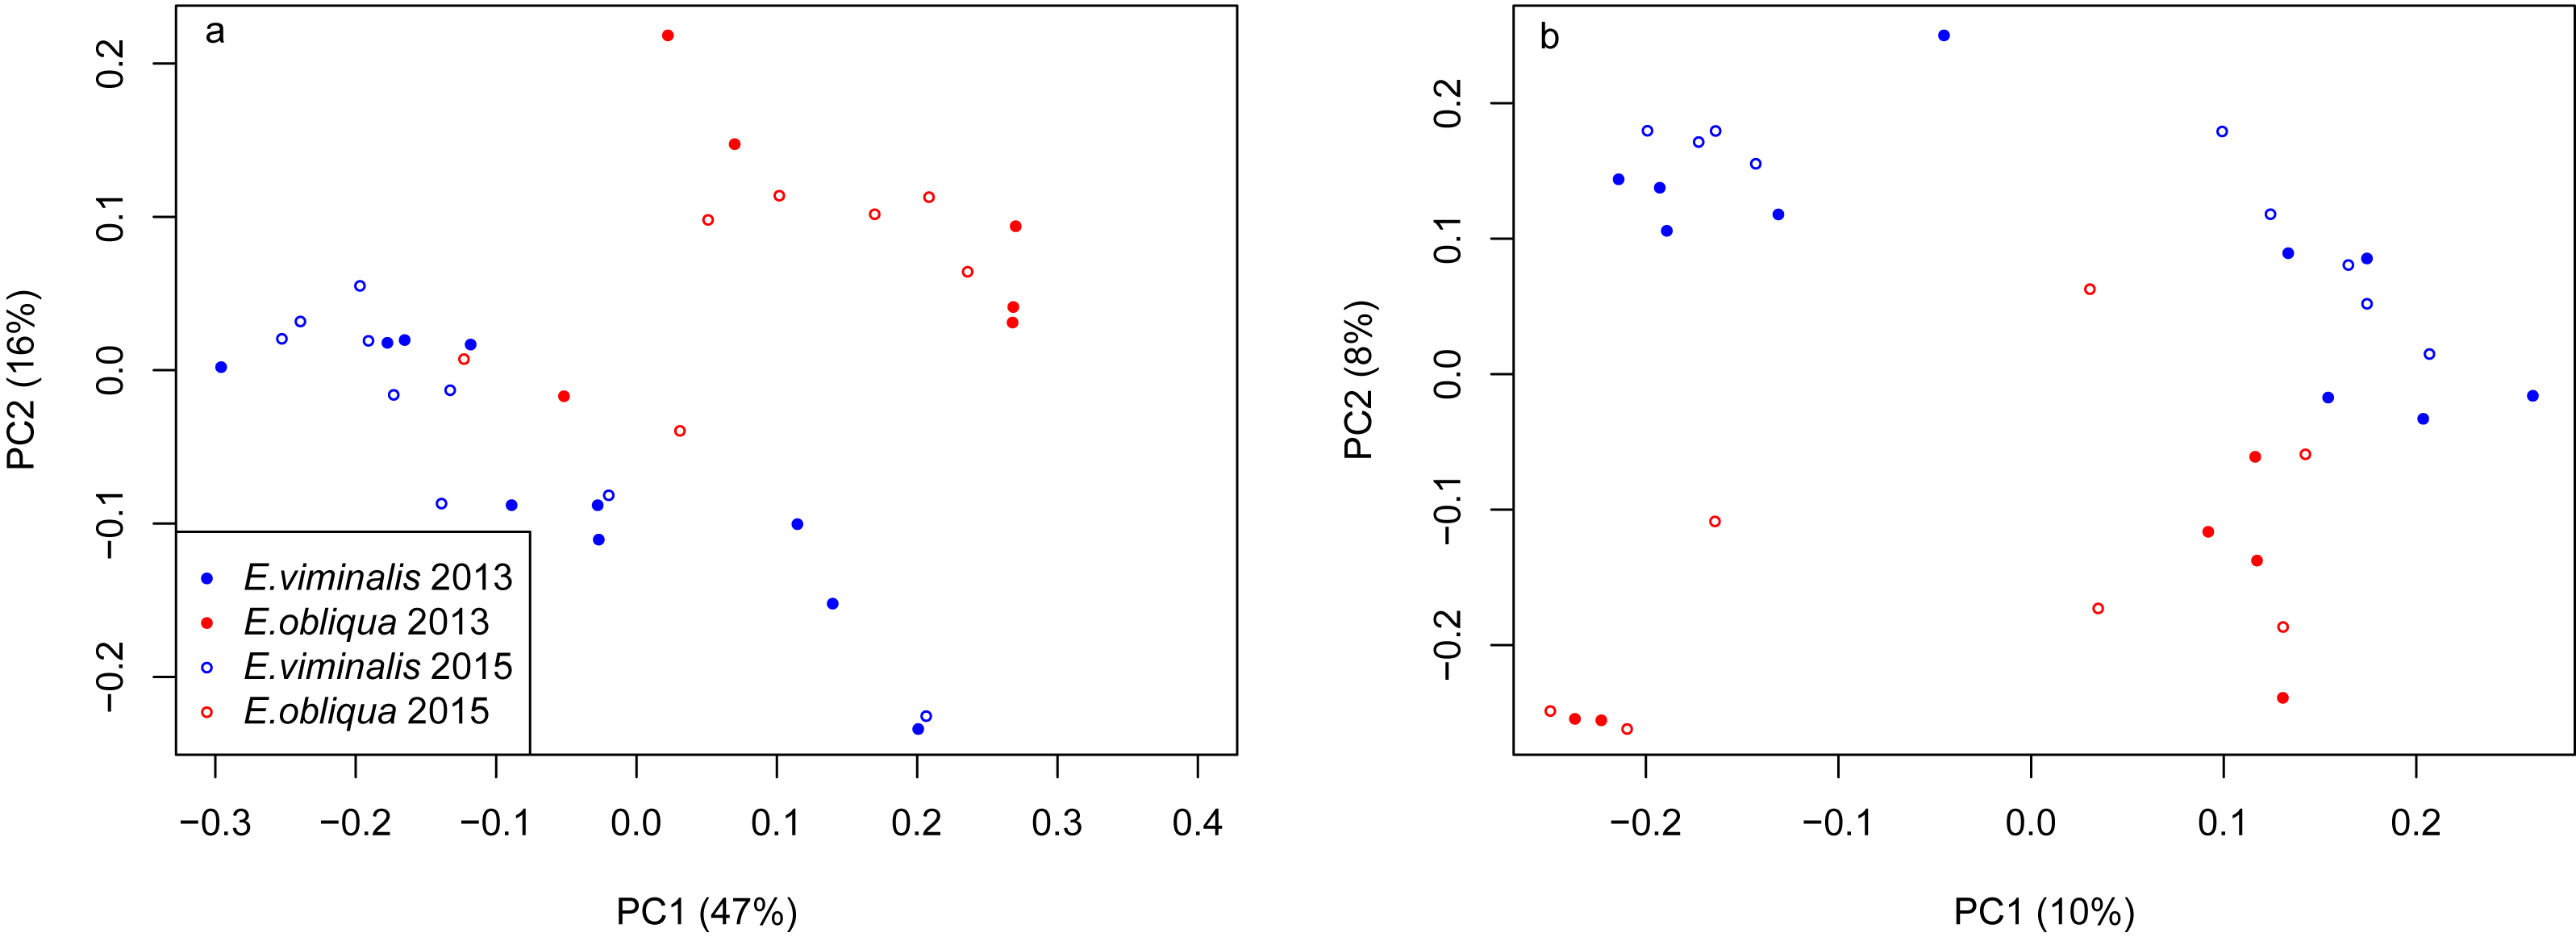 The Koala (Phascolarctos cinereus) faecal microbiome differs